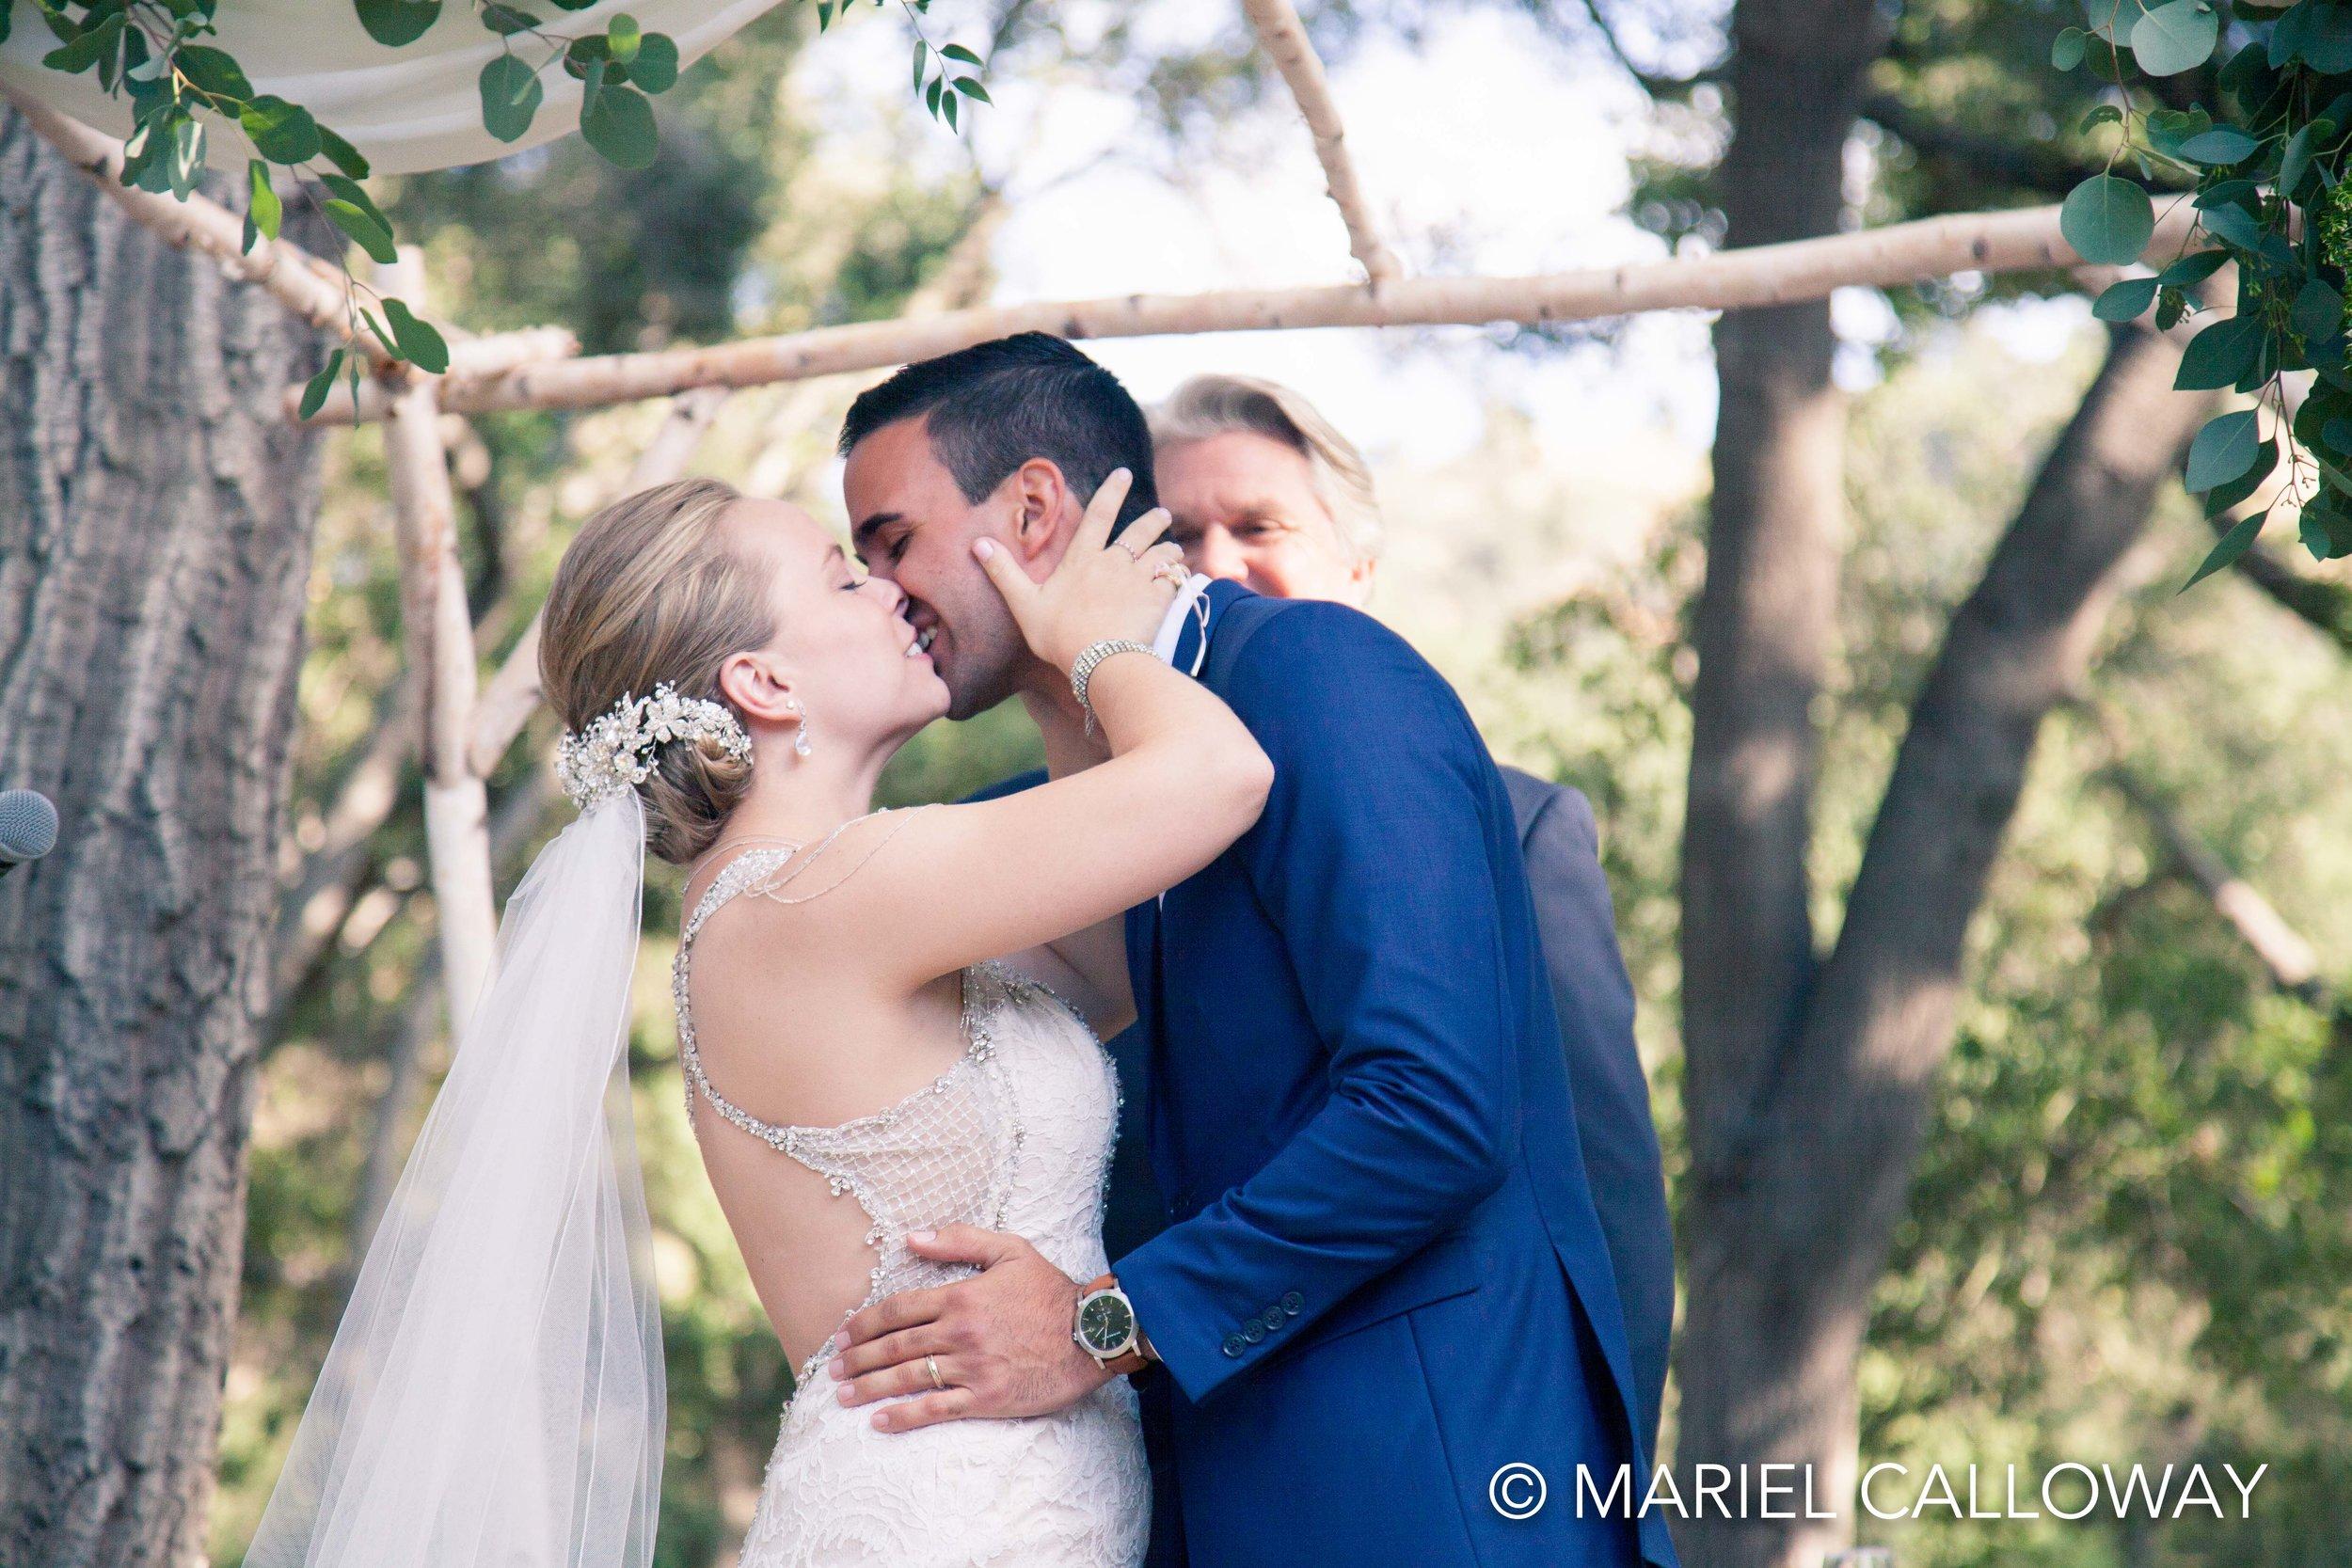 Mariel-Calloway-Los-Angeles-Wedding-Photography-Smith-24.jpg